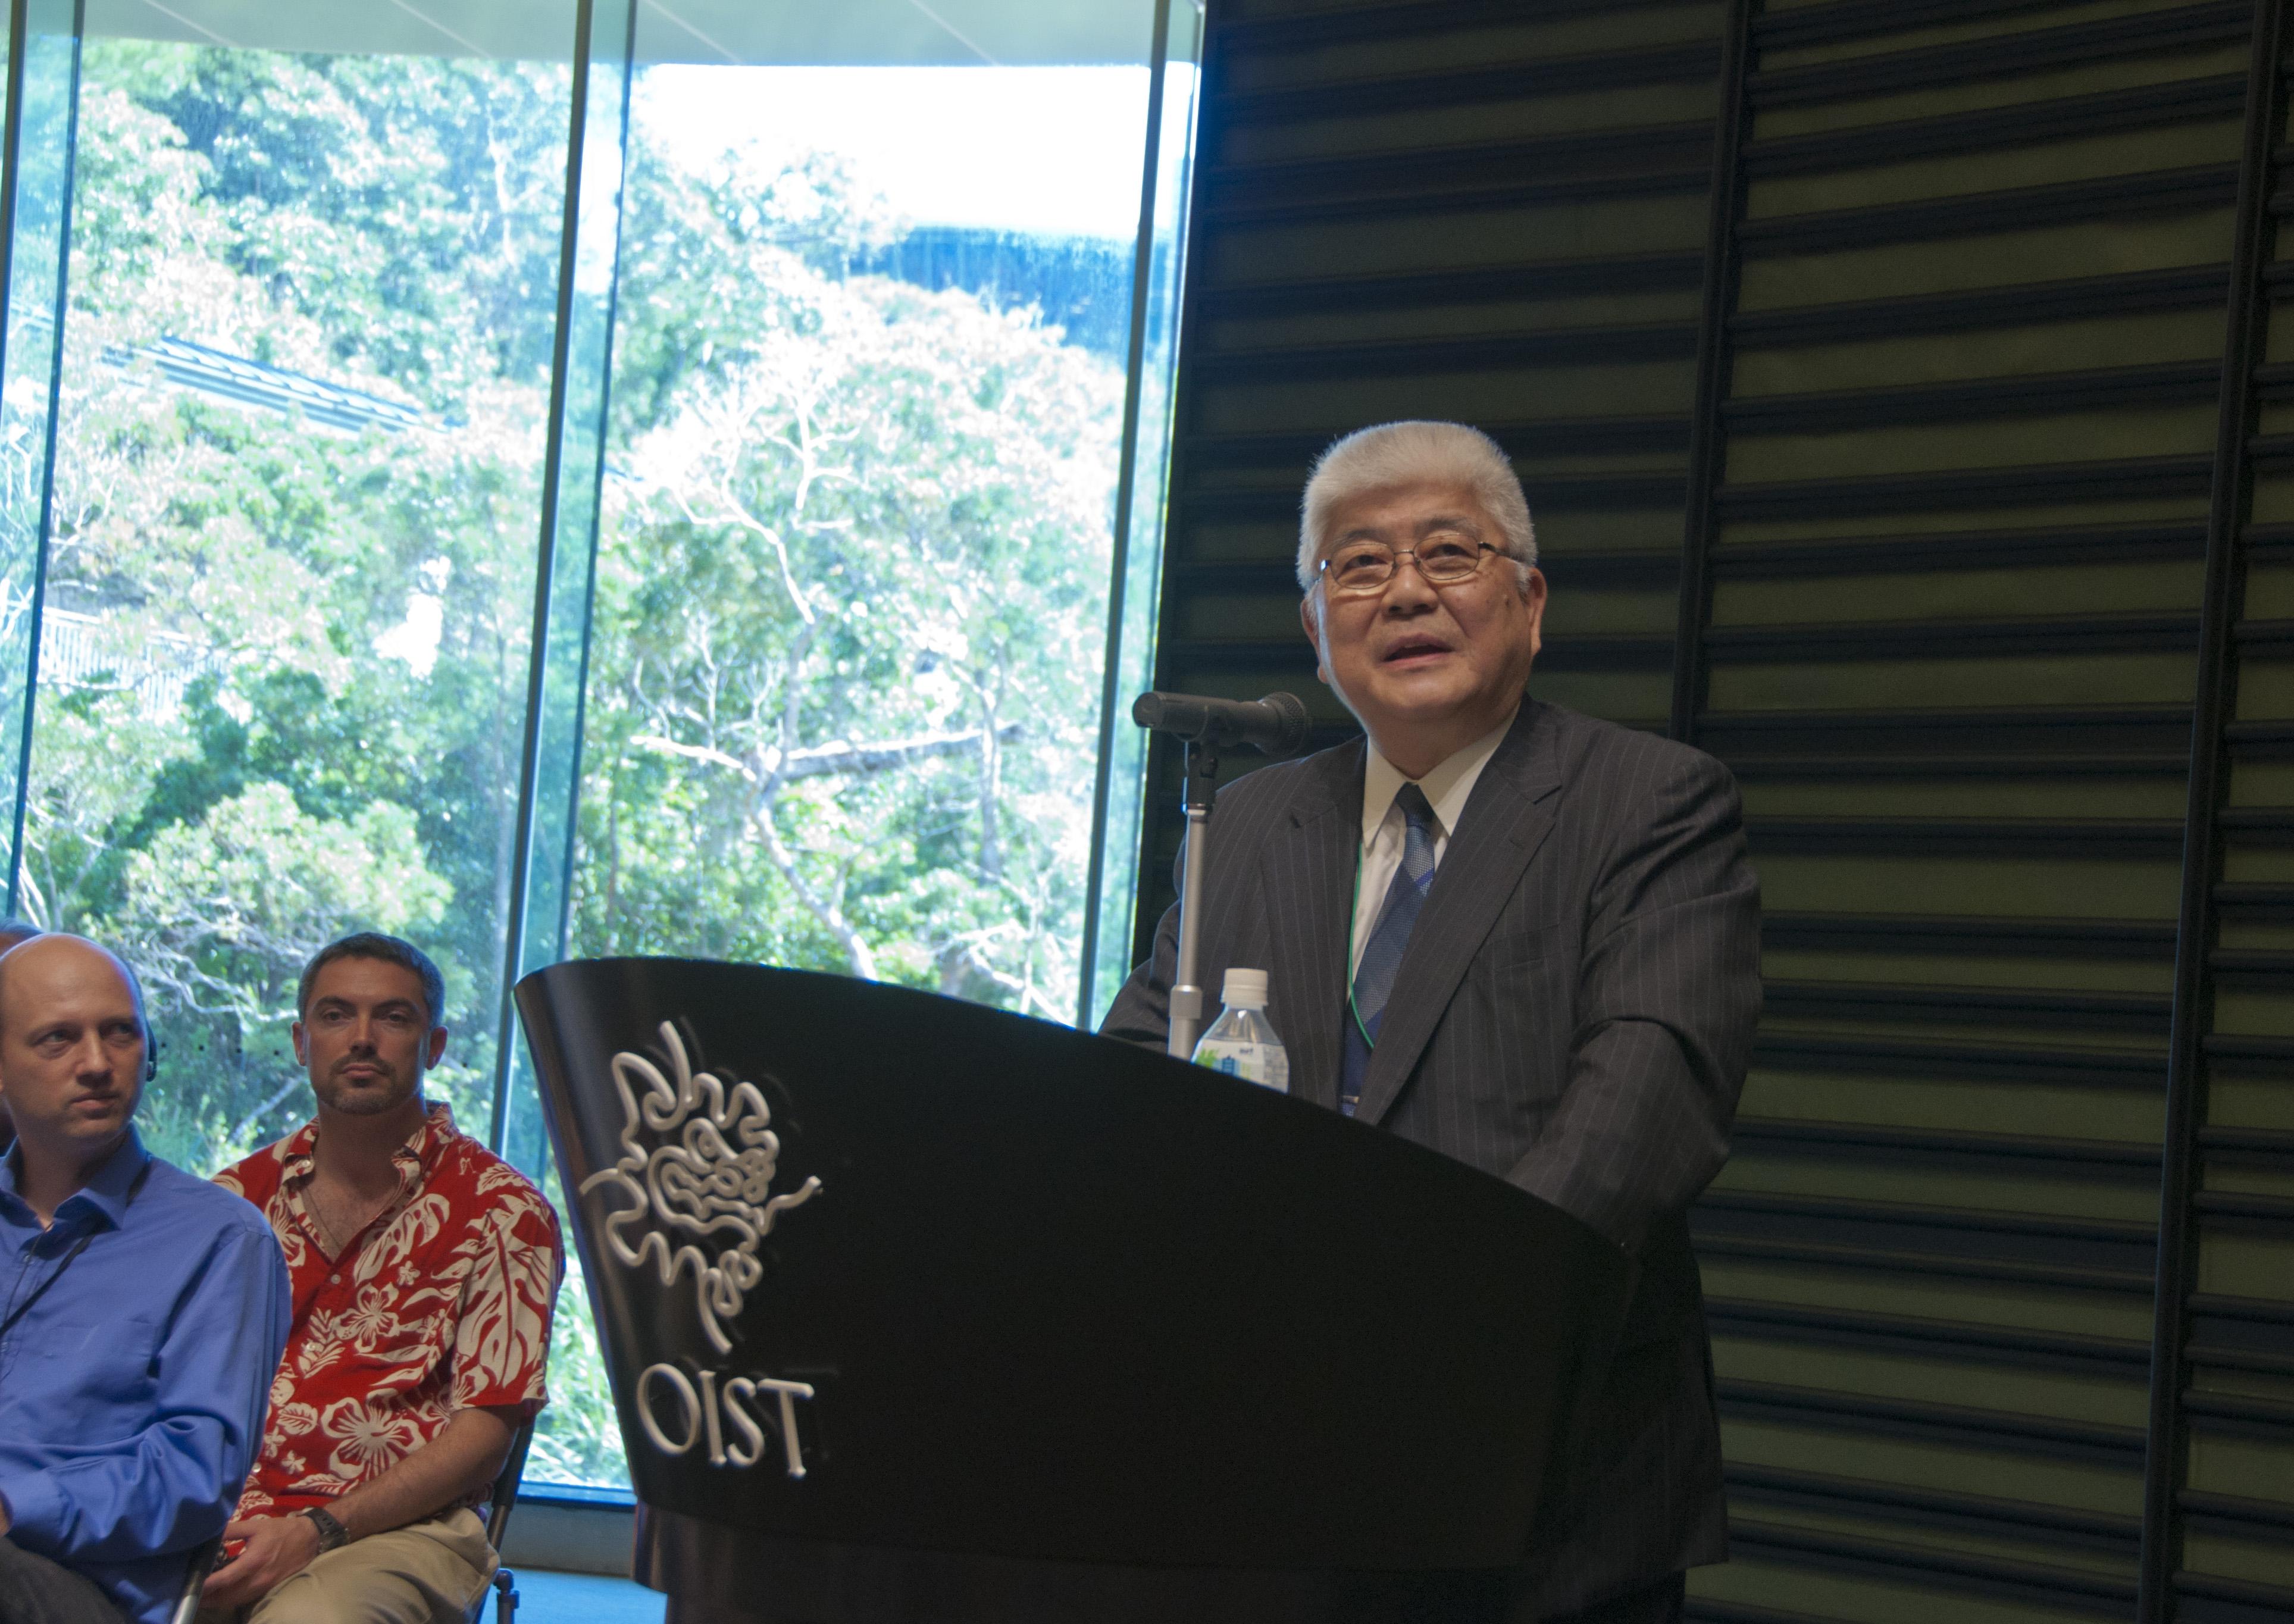 Dr. Ichiro Kanazawa, Board of Governors, OIST Graduate School